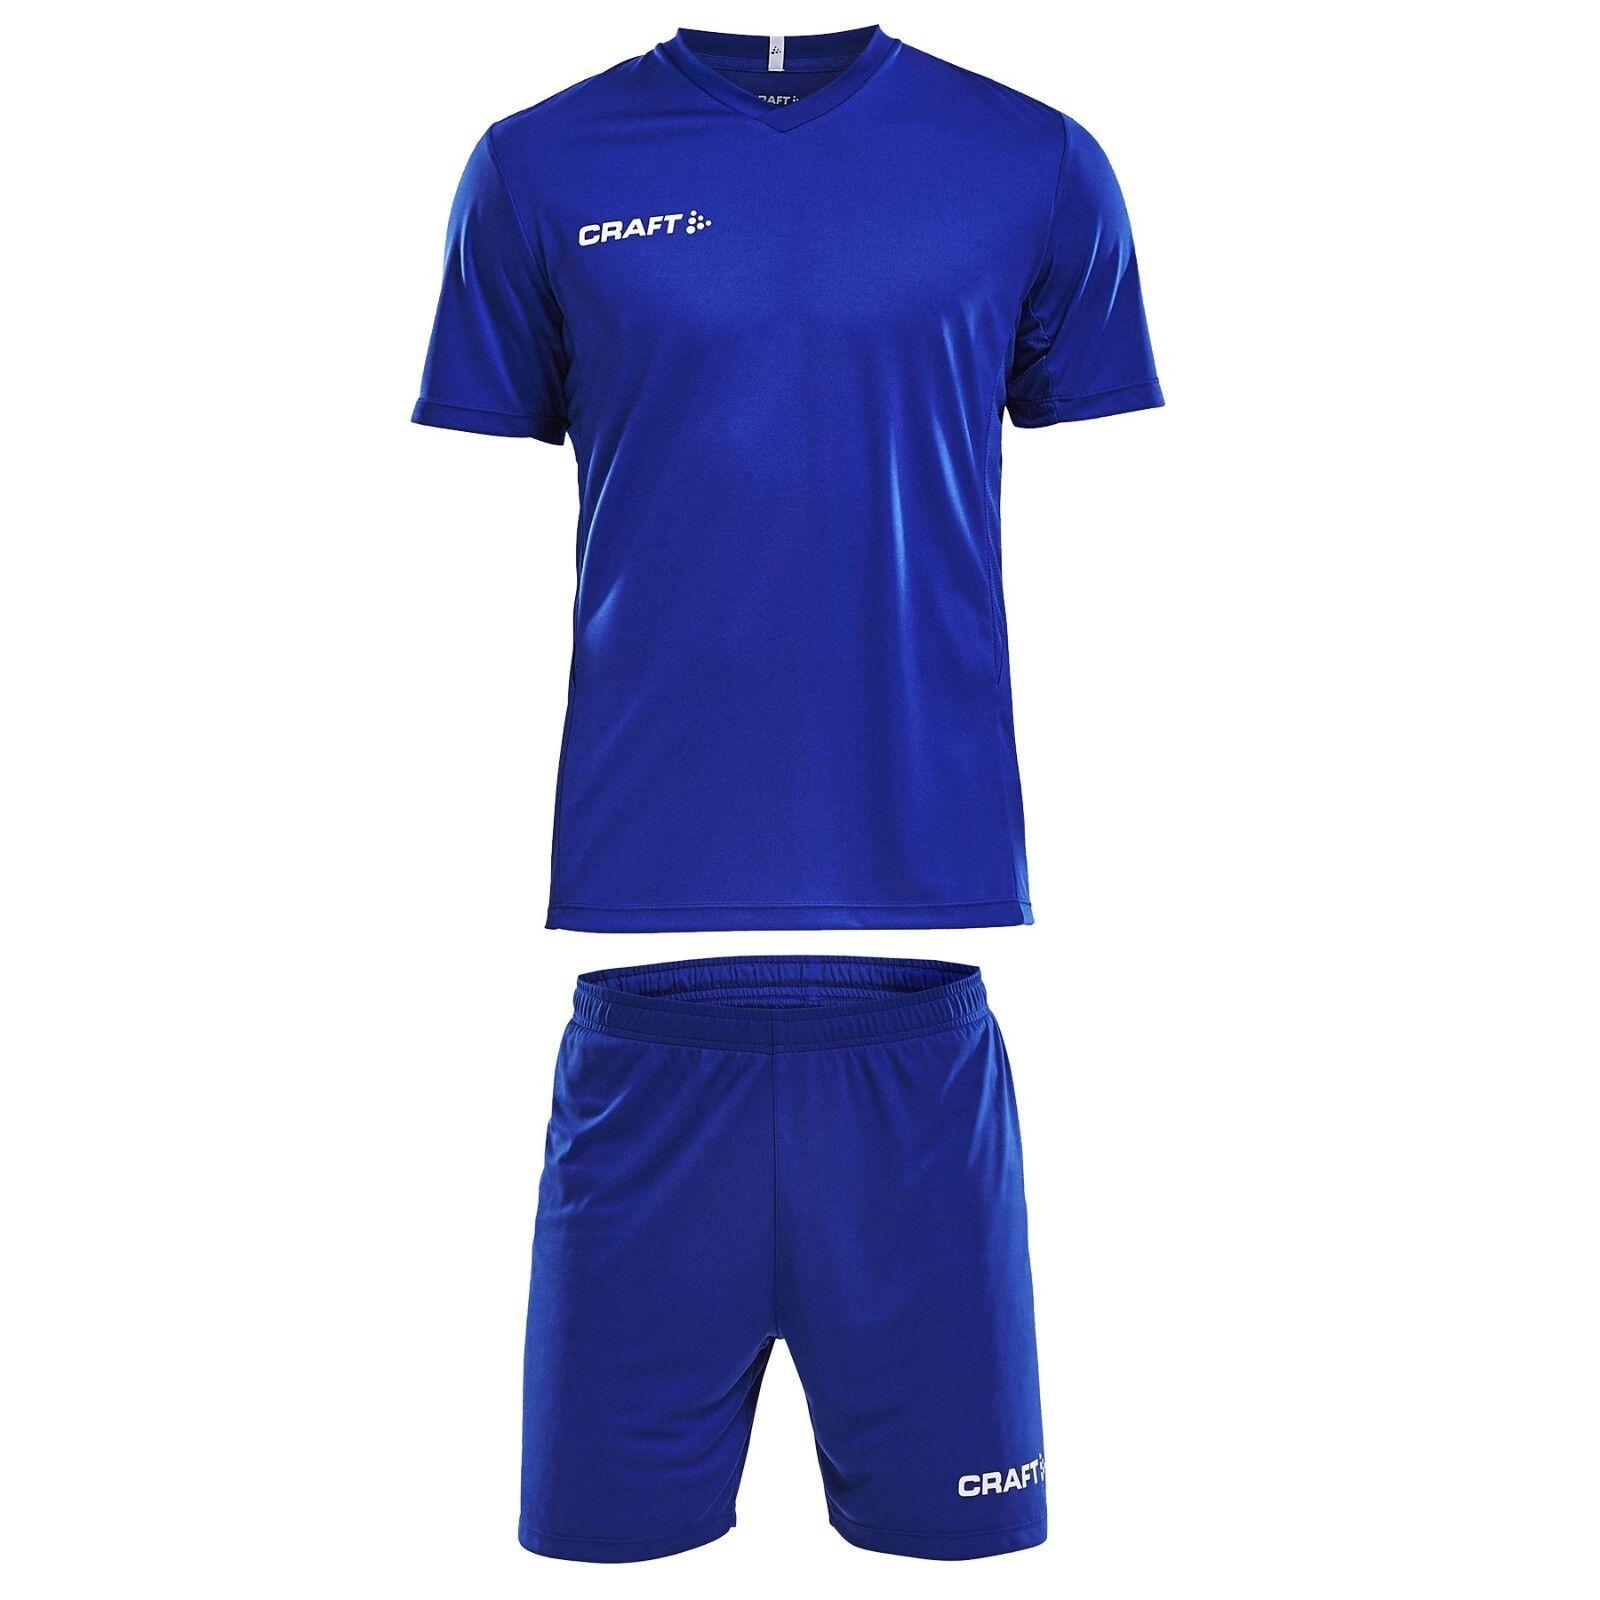 Craft Fußball Set Trikot + + + Short Trikotset Teamwear 10er 12er 14er Trikotsatz  | Abrechnungspreis  42100f